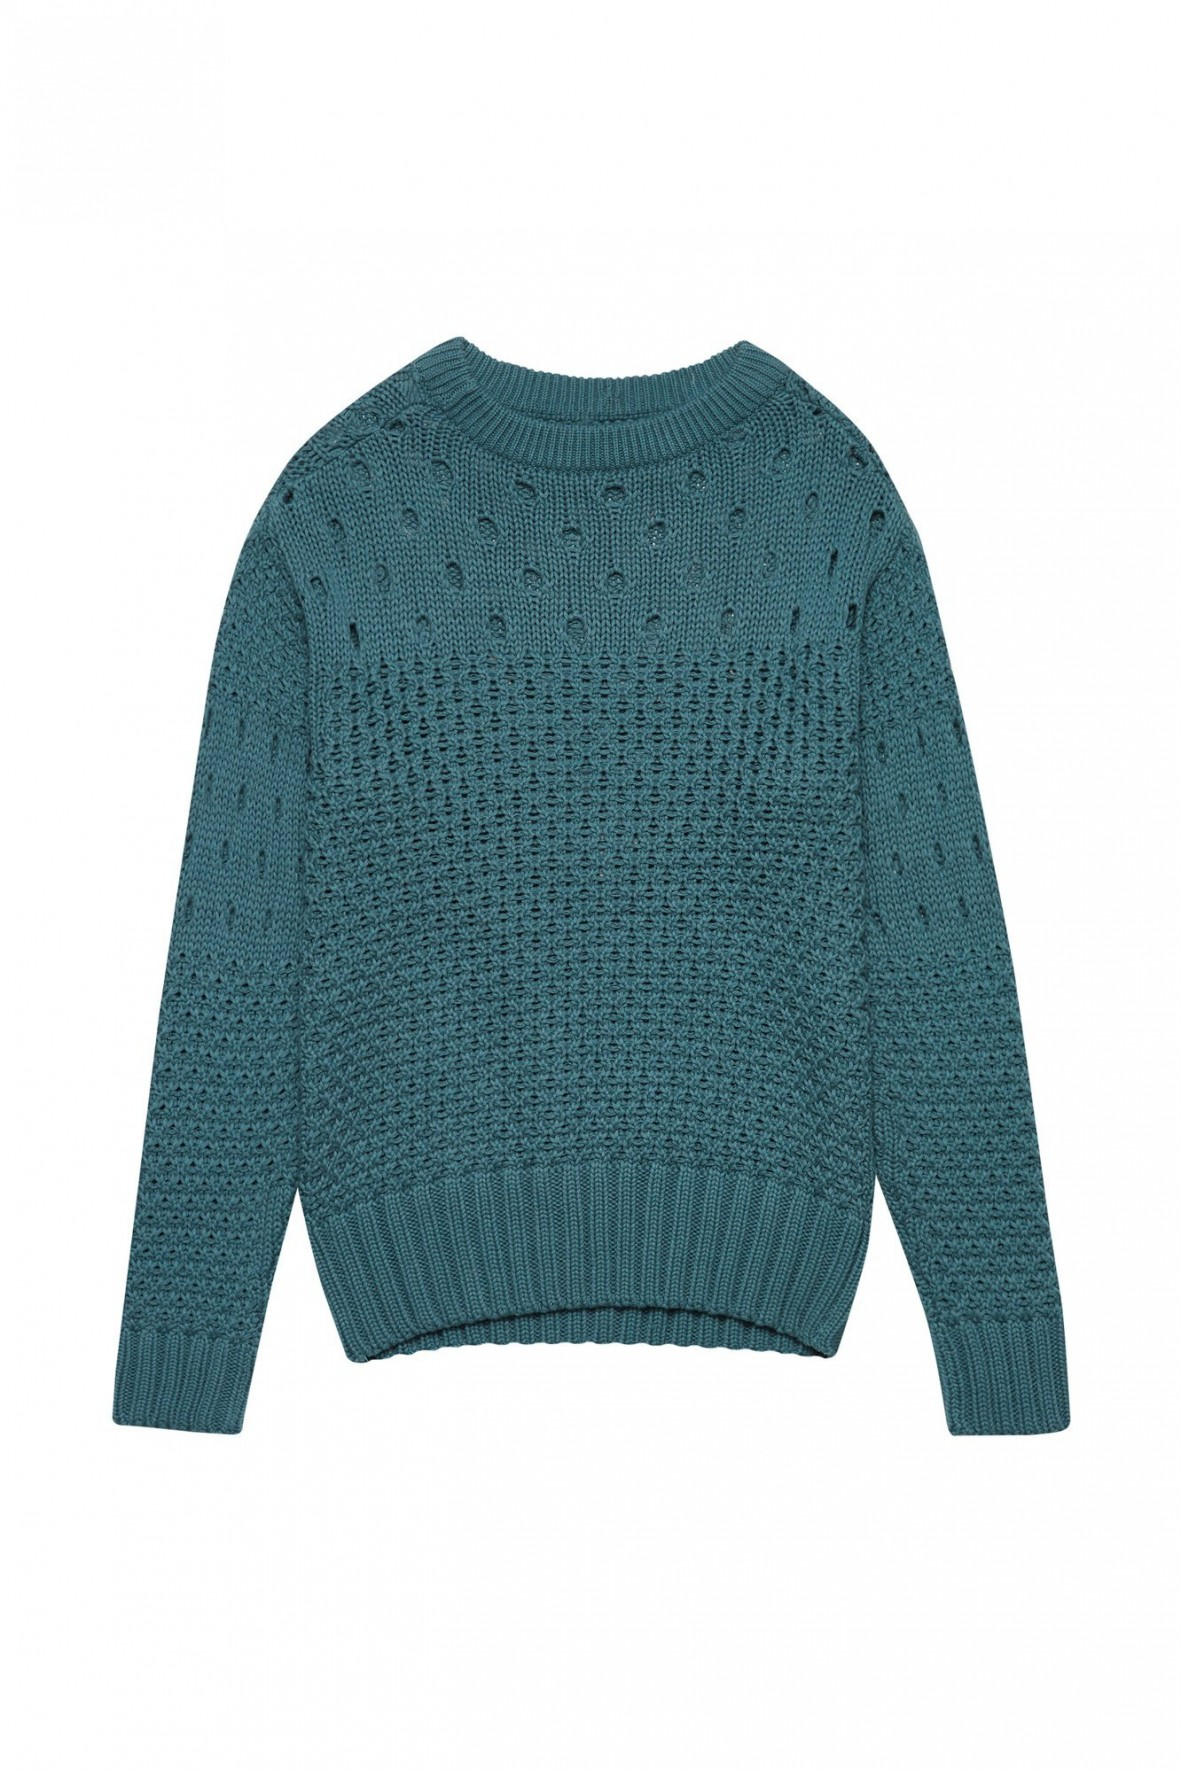 Zielony sweter damski z ozdobnym splotem